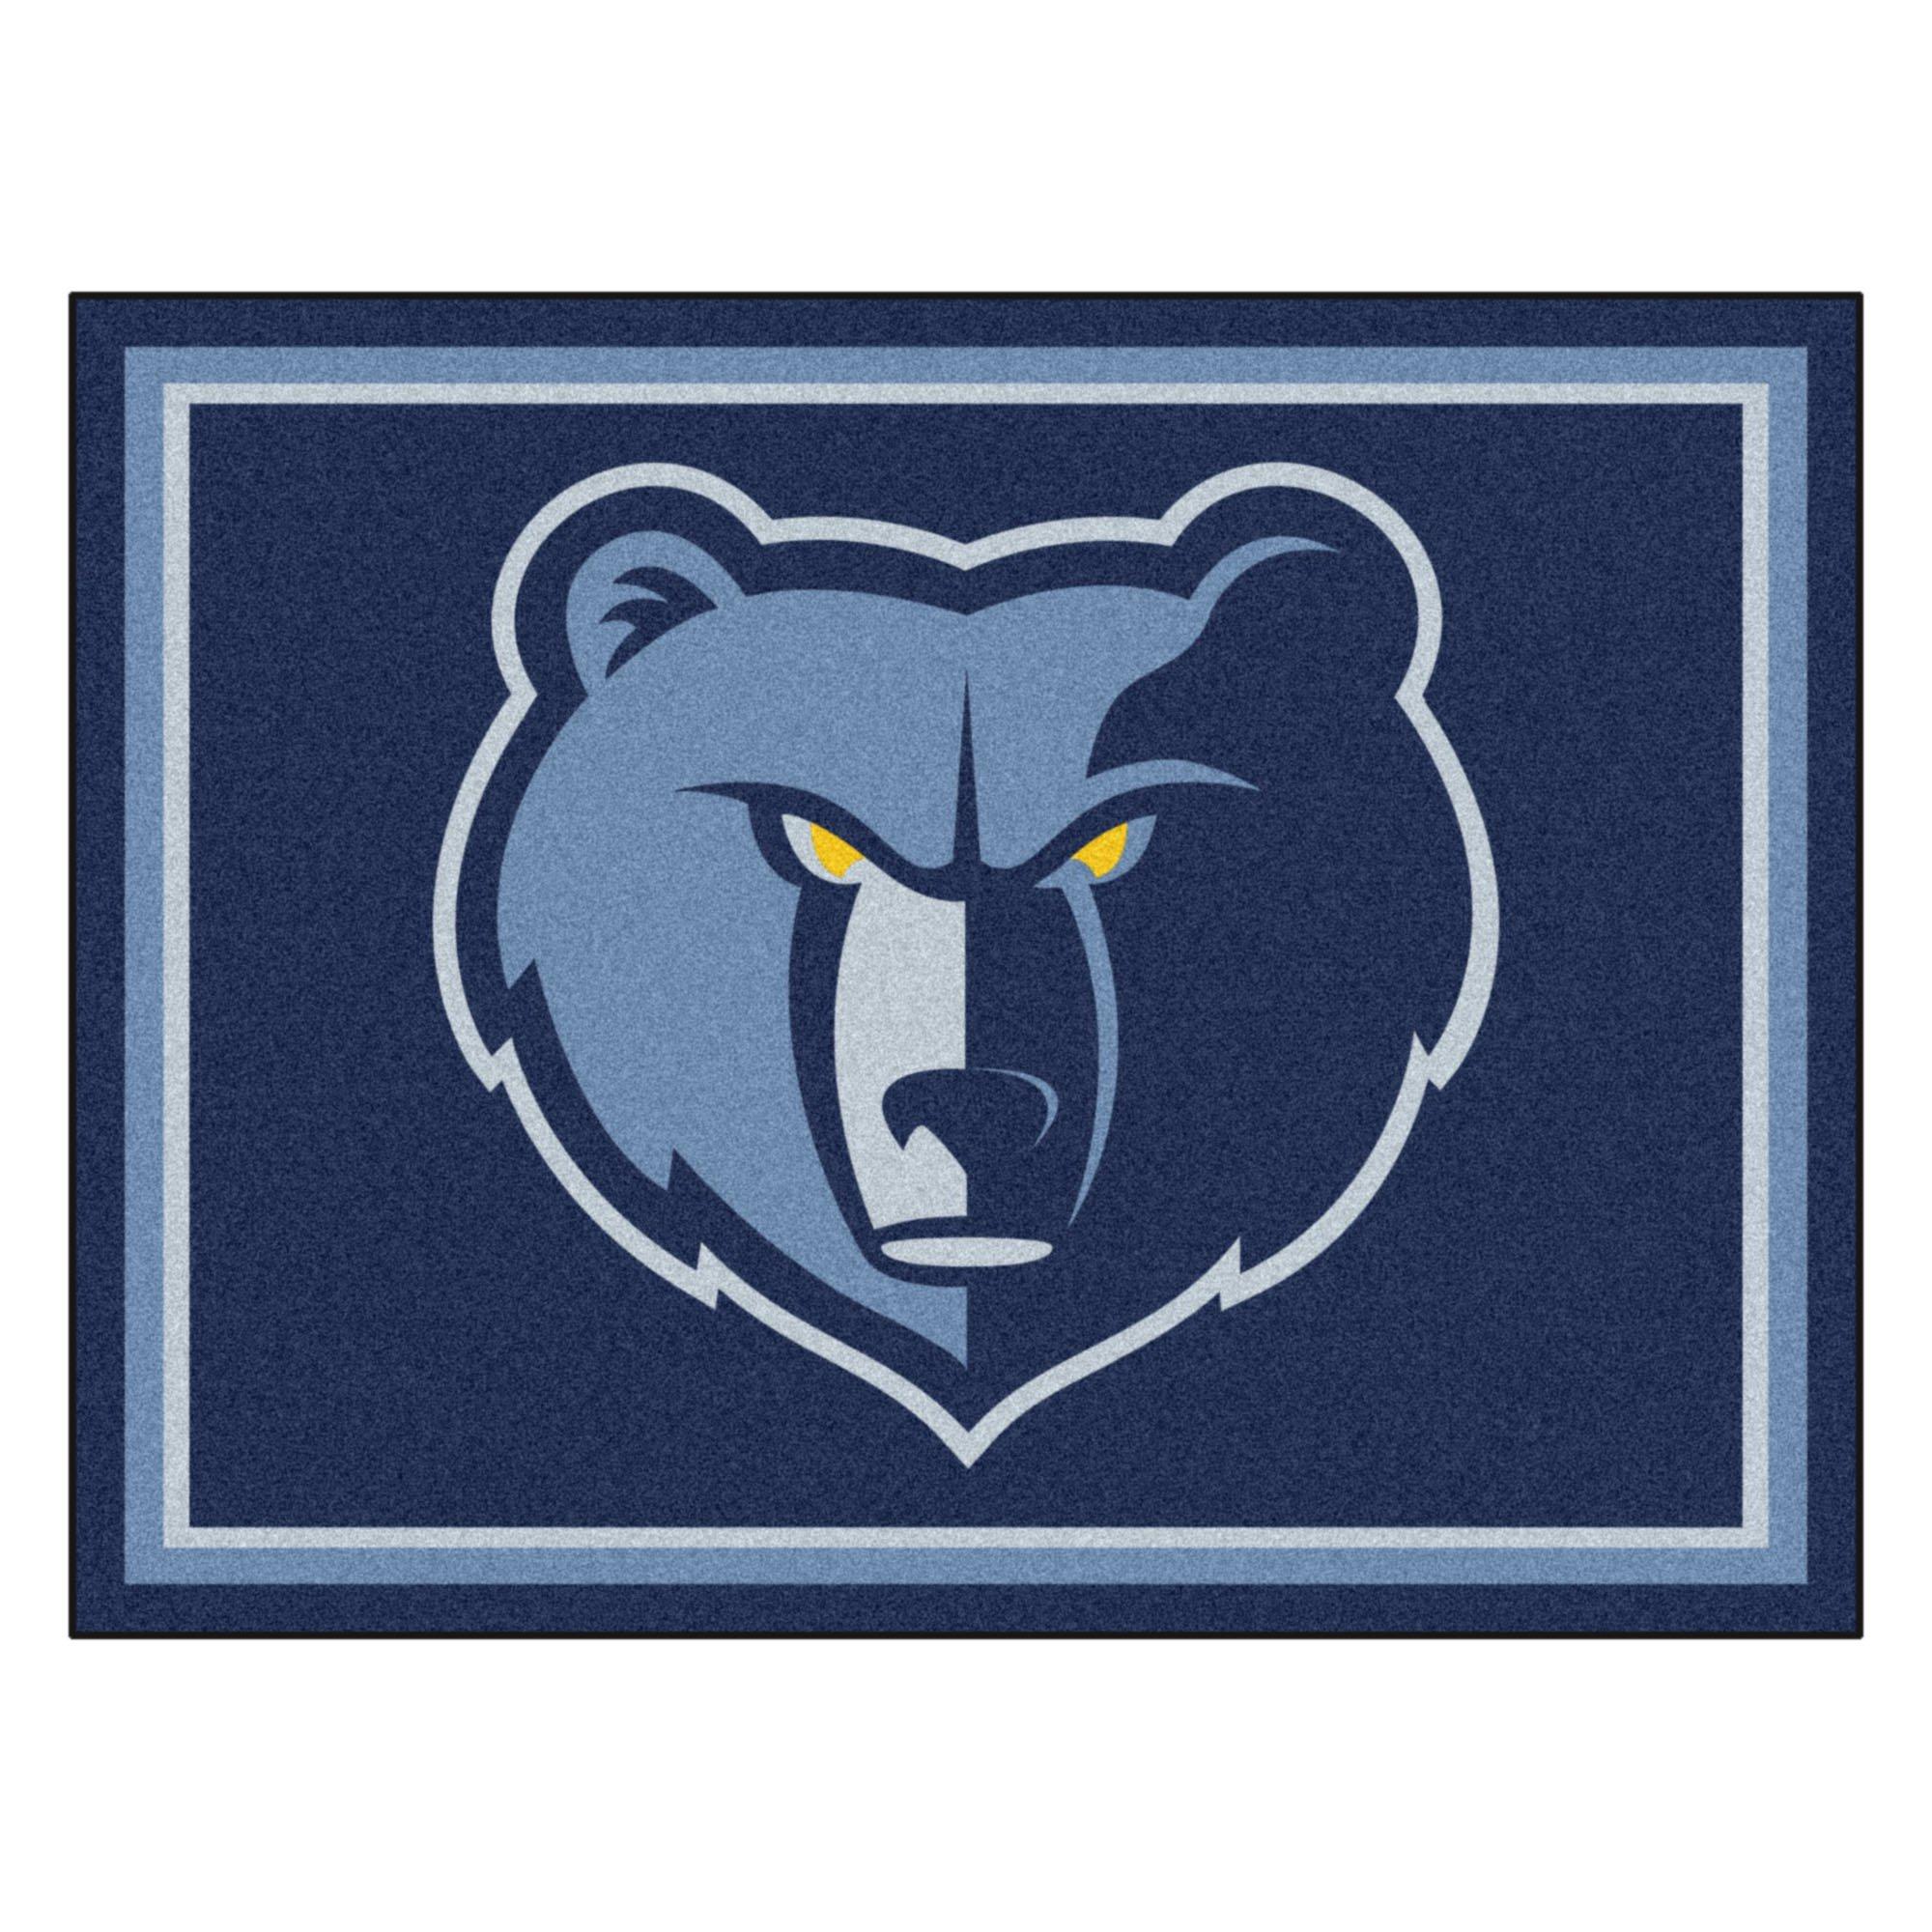 FANMATS 17456 NBA Memphis Grizzlies Rug